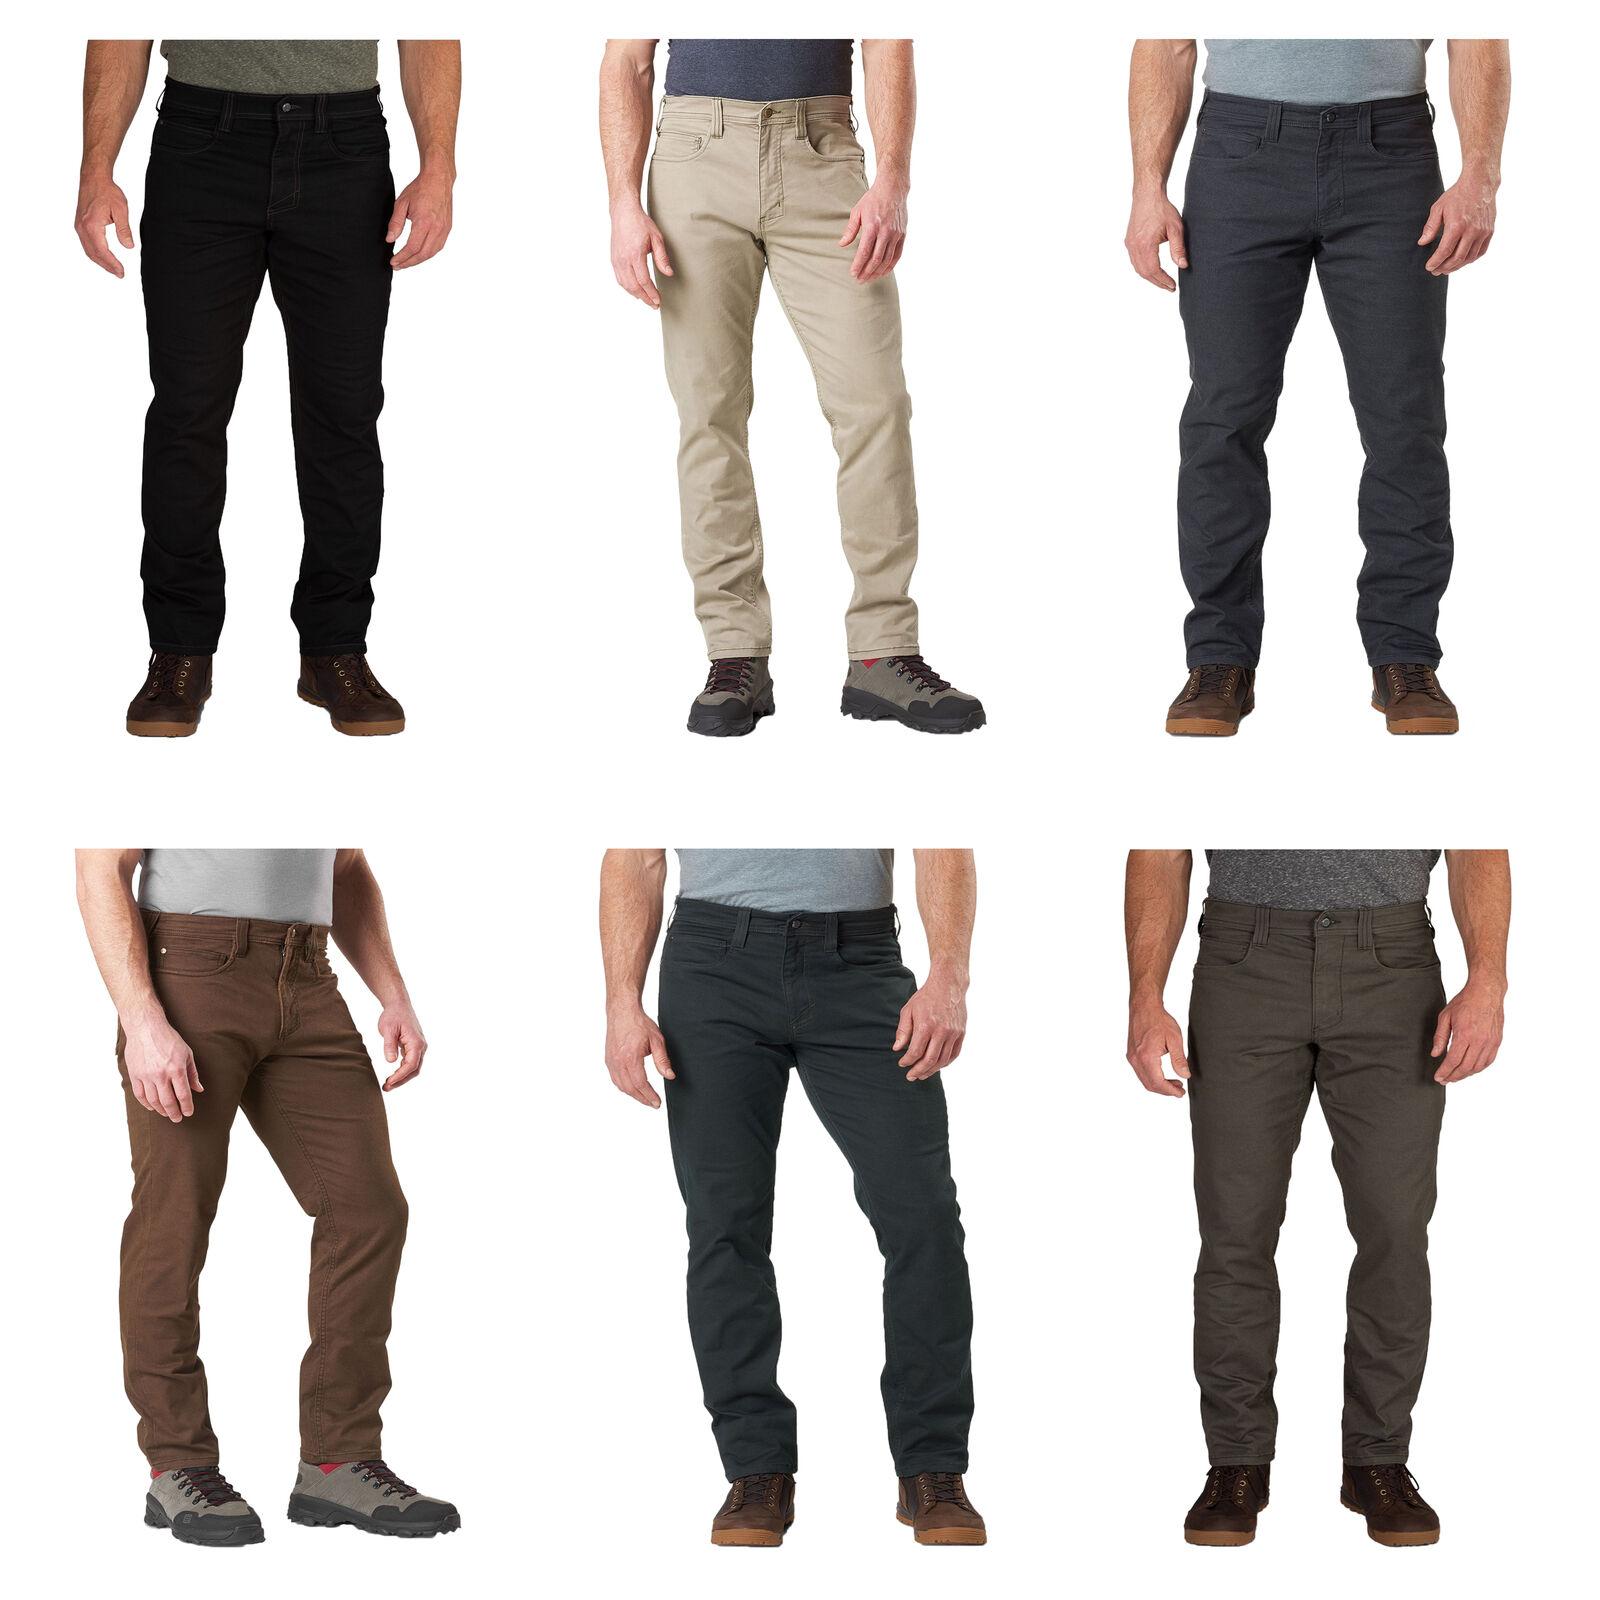 5.11 Tactical Men's Defender-Flex Slim Pant Style 74464 Waist 28-40 Inseam 28-32